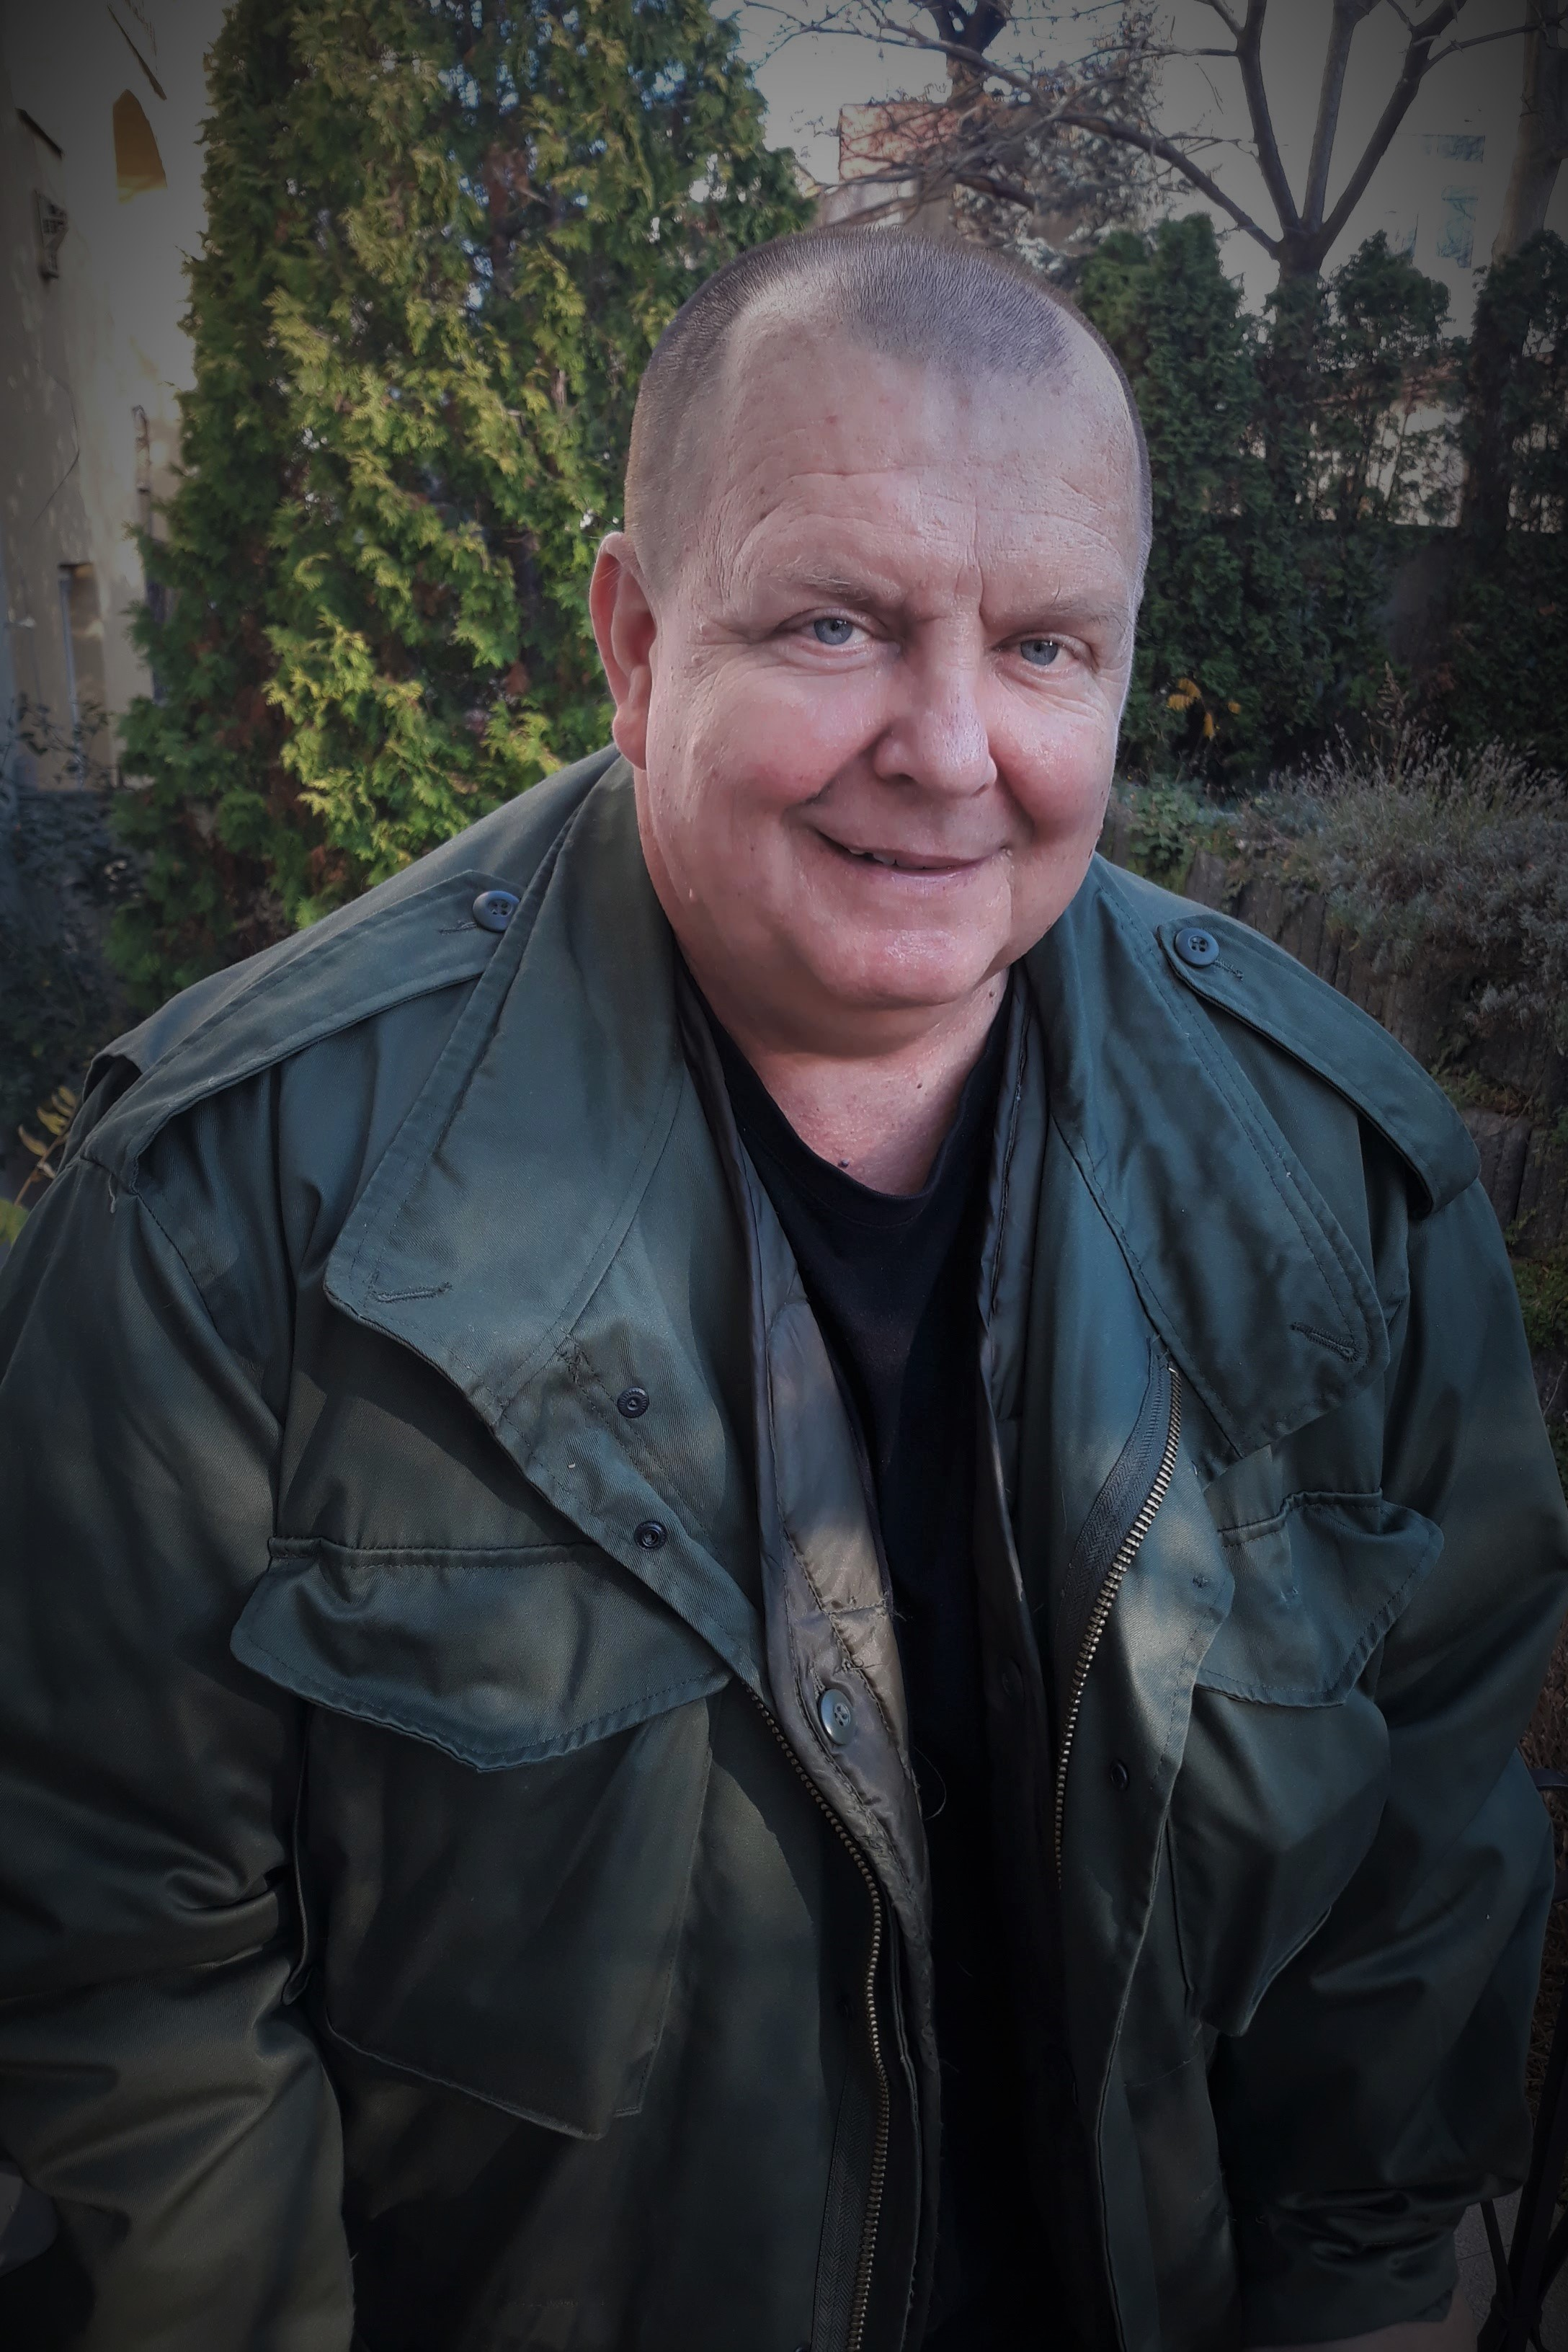 Jan Ďurďák